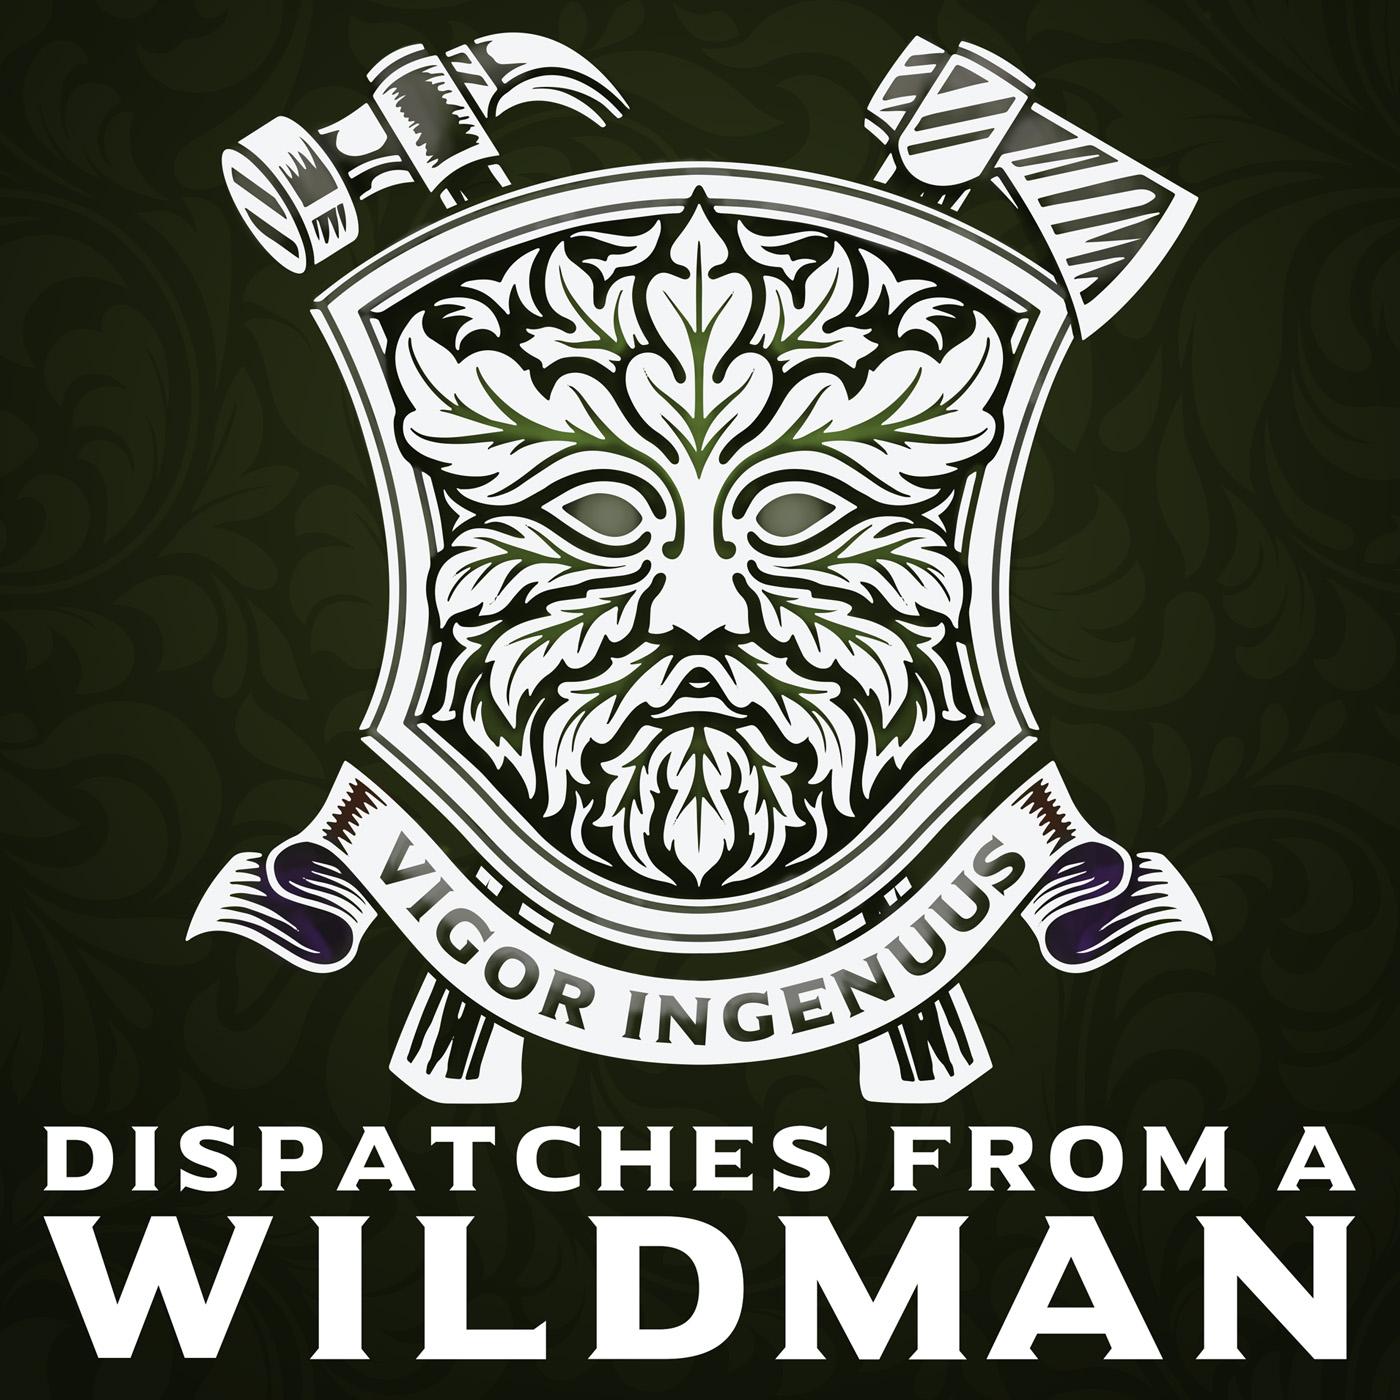 Dispatches From A Wildman show art